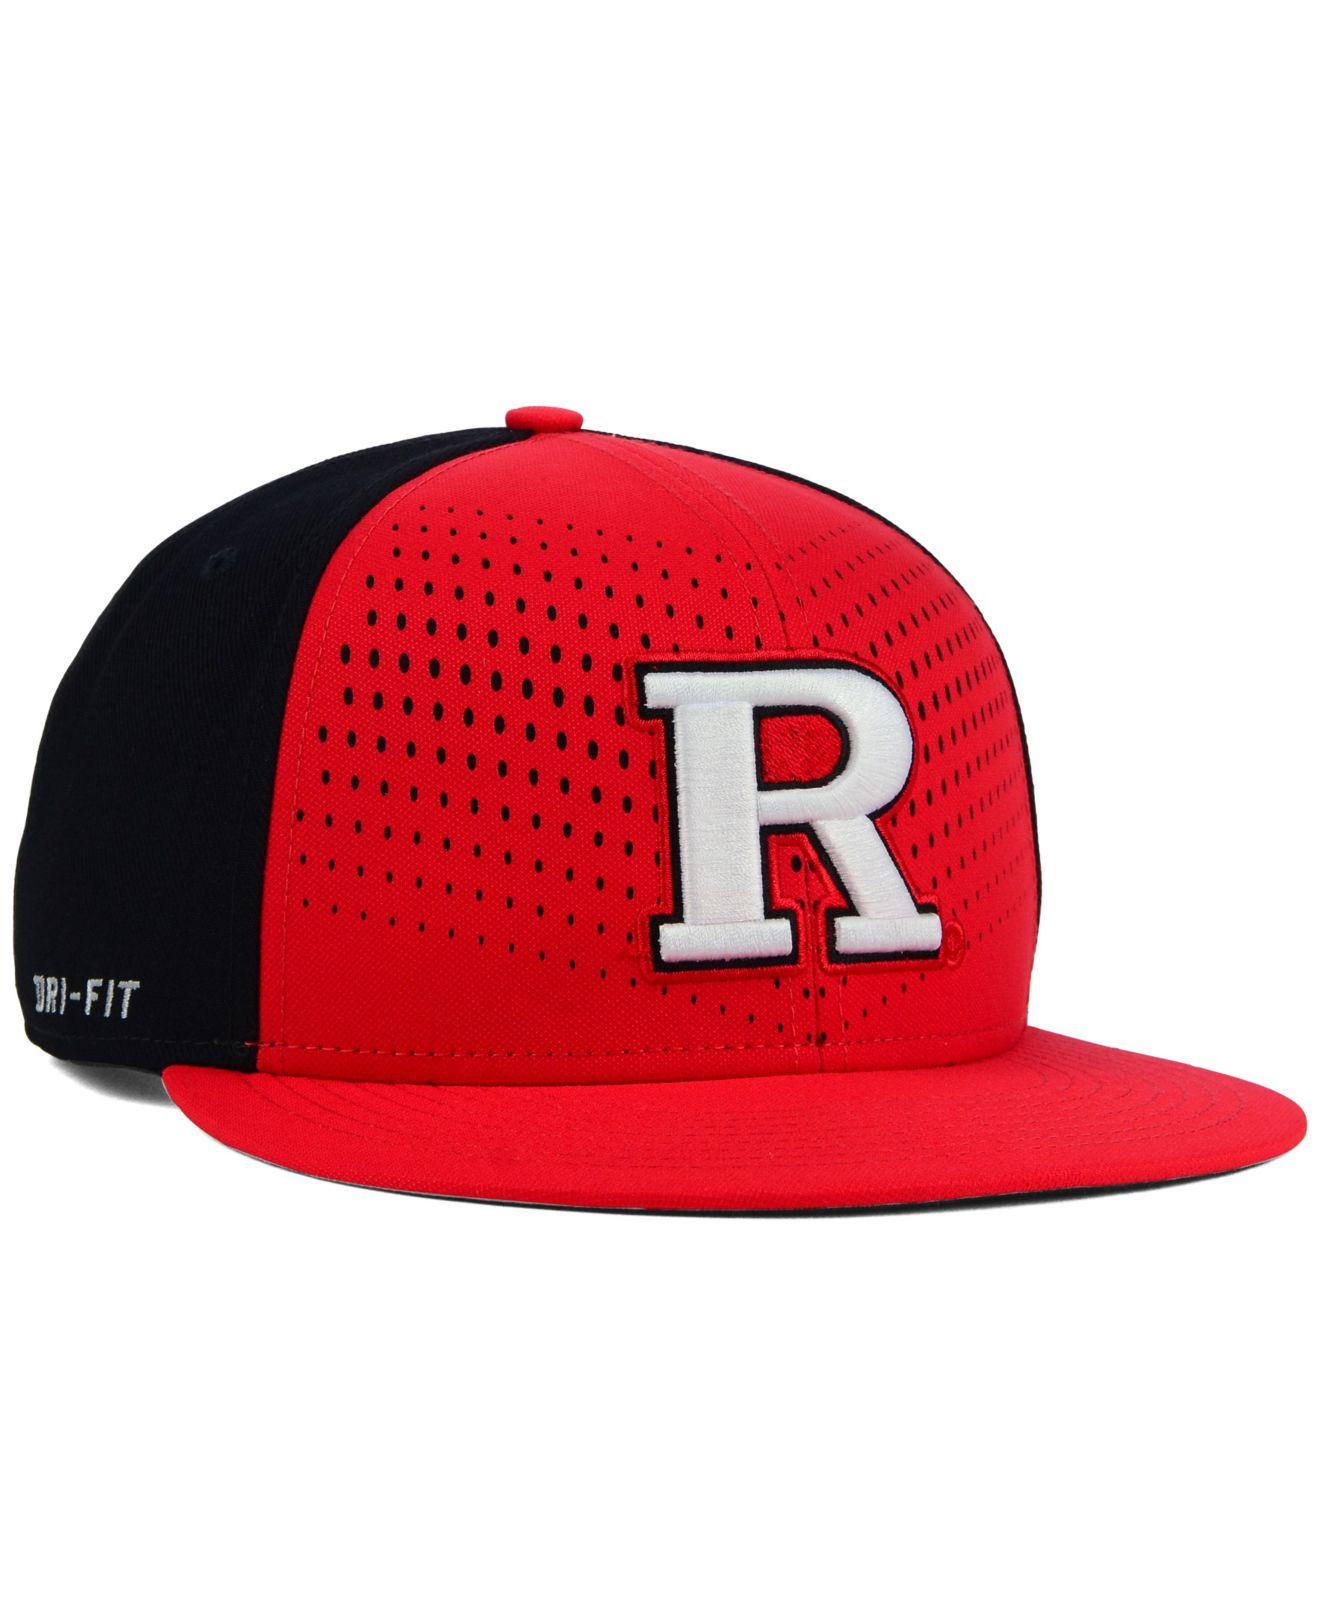 Lyst - Nike Rutgers Scarlet Knights True Seasonal Snapback Cap in ... 33d66ffac20